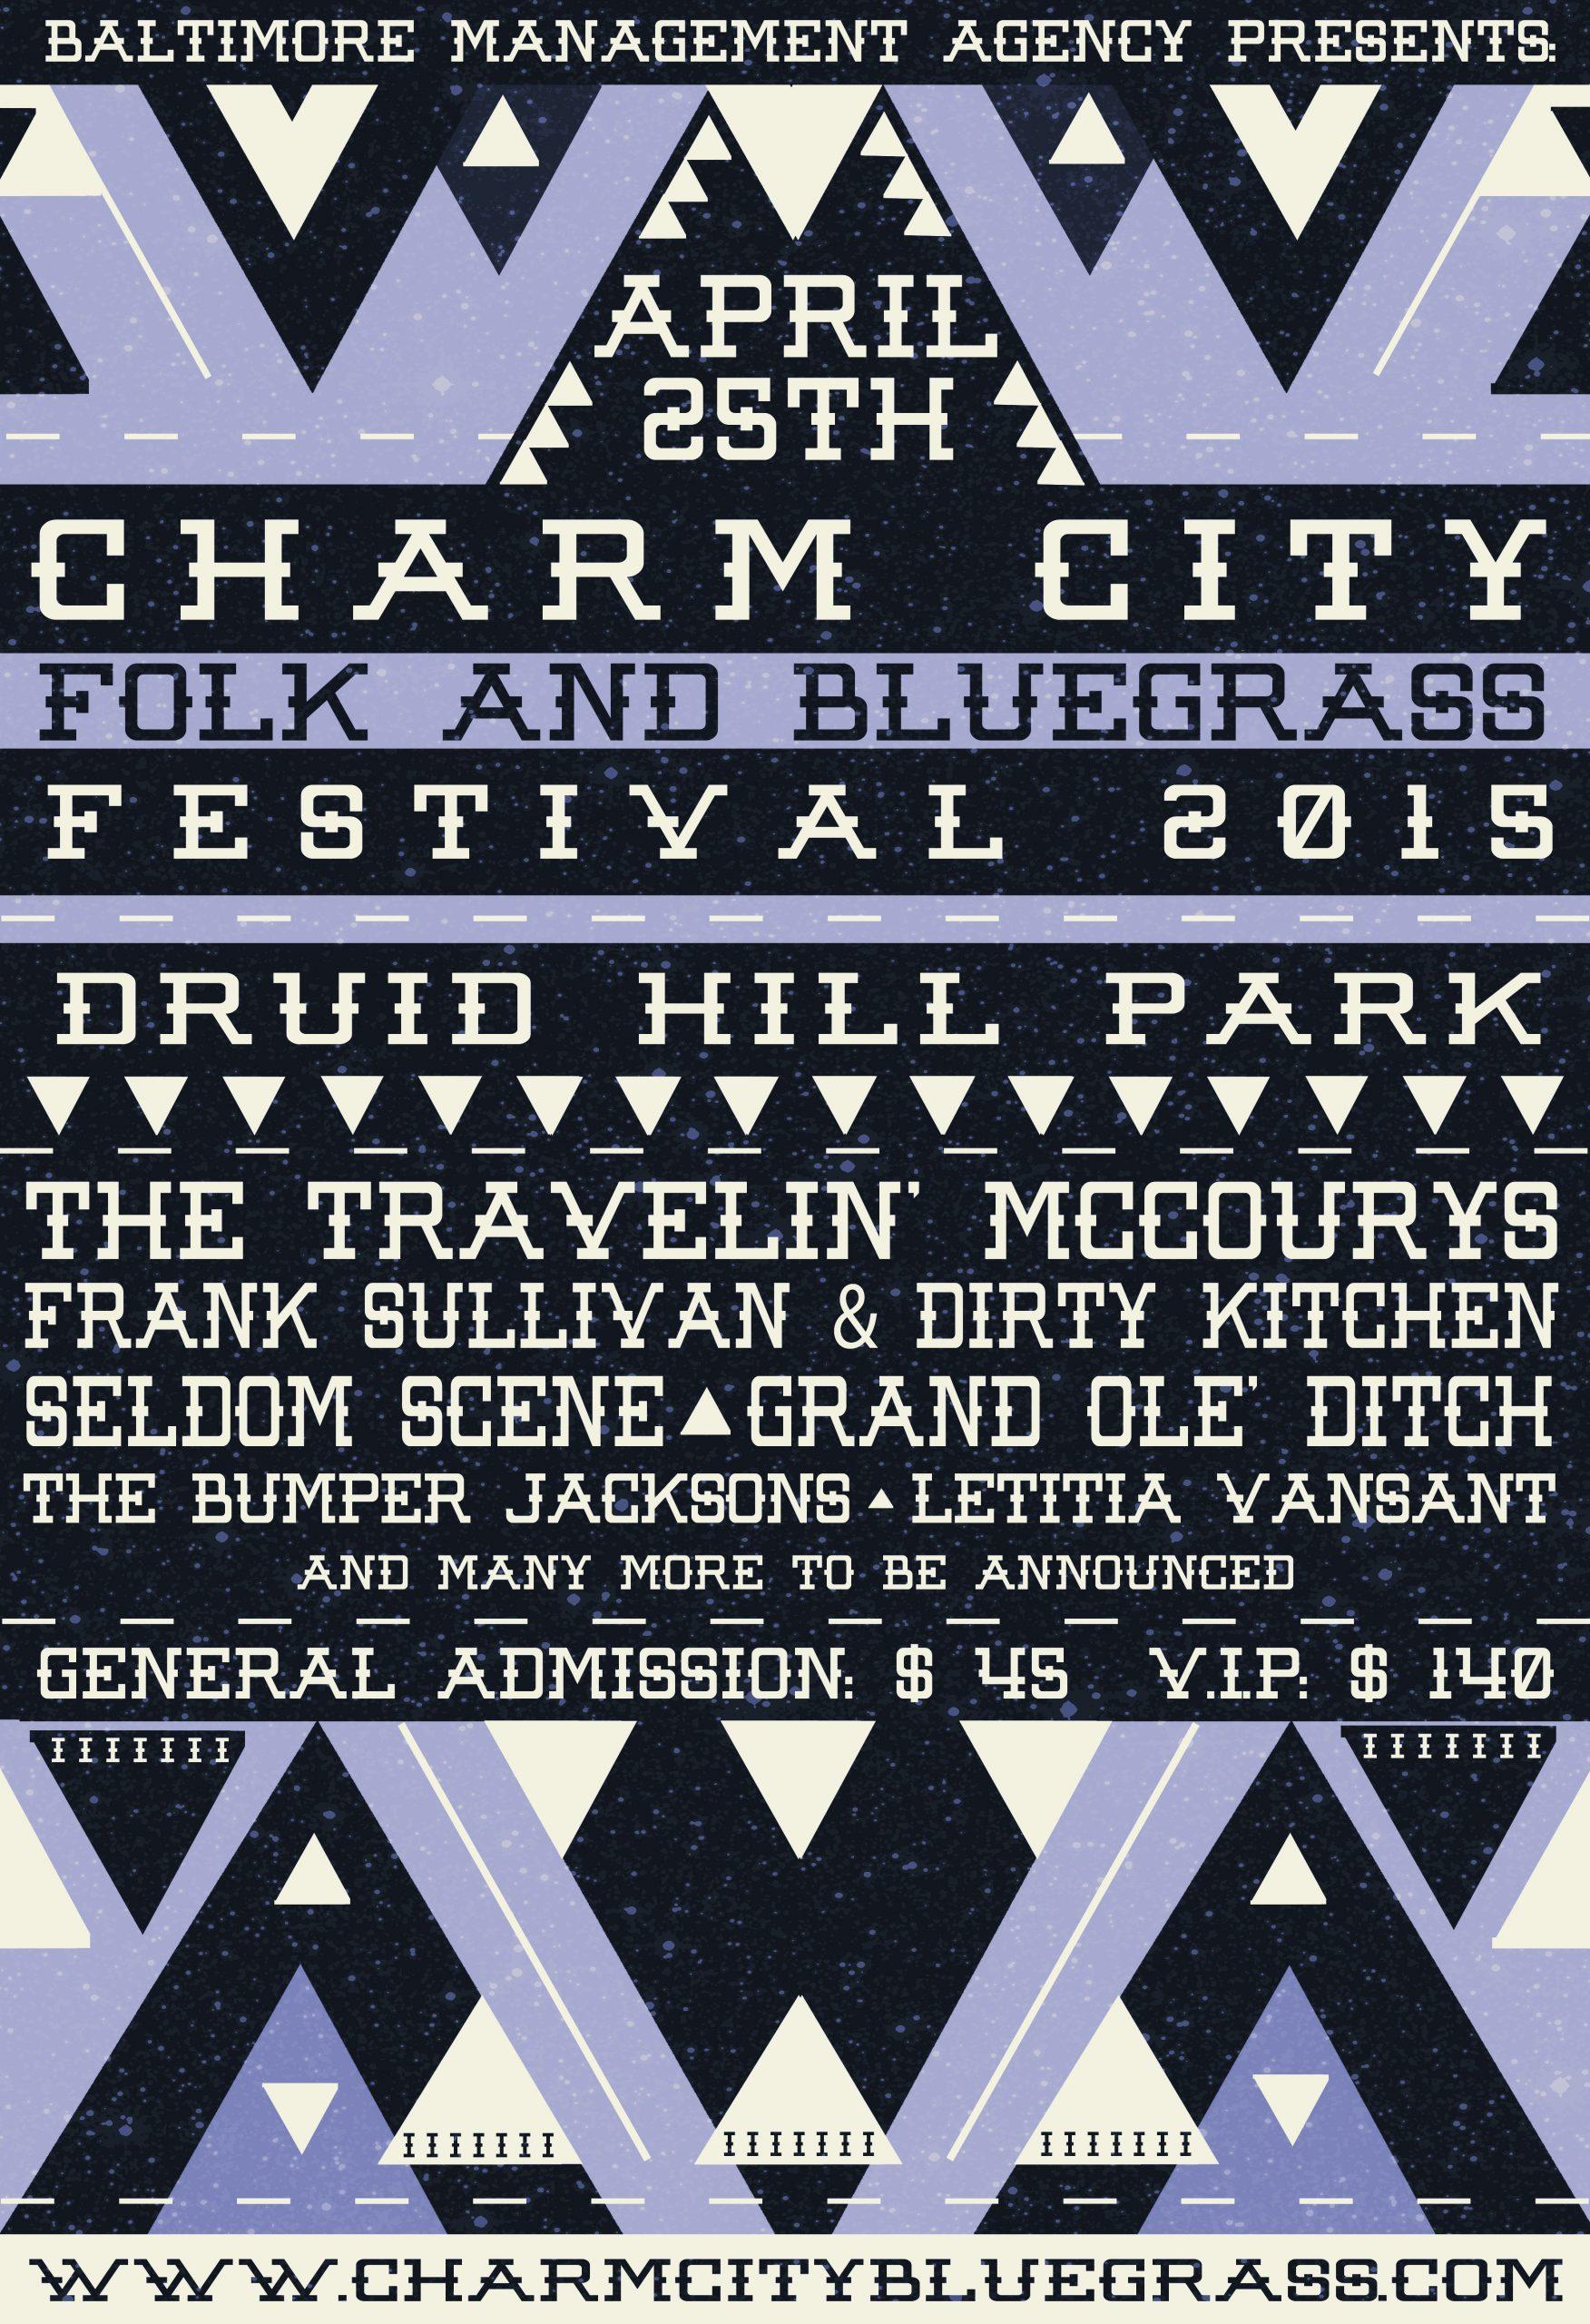 Charm City Folk and Bluegrass Festival Announces Initial Lineup